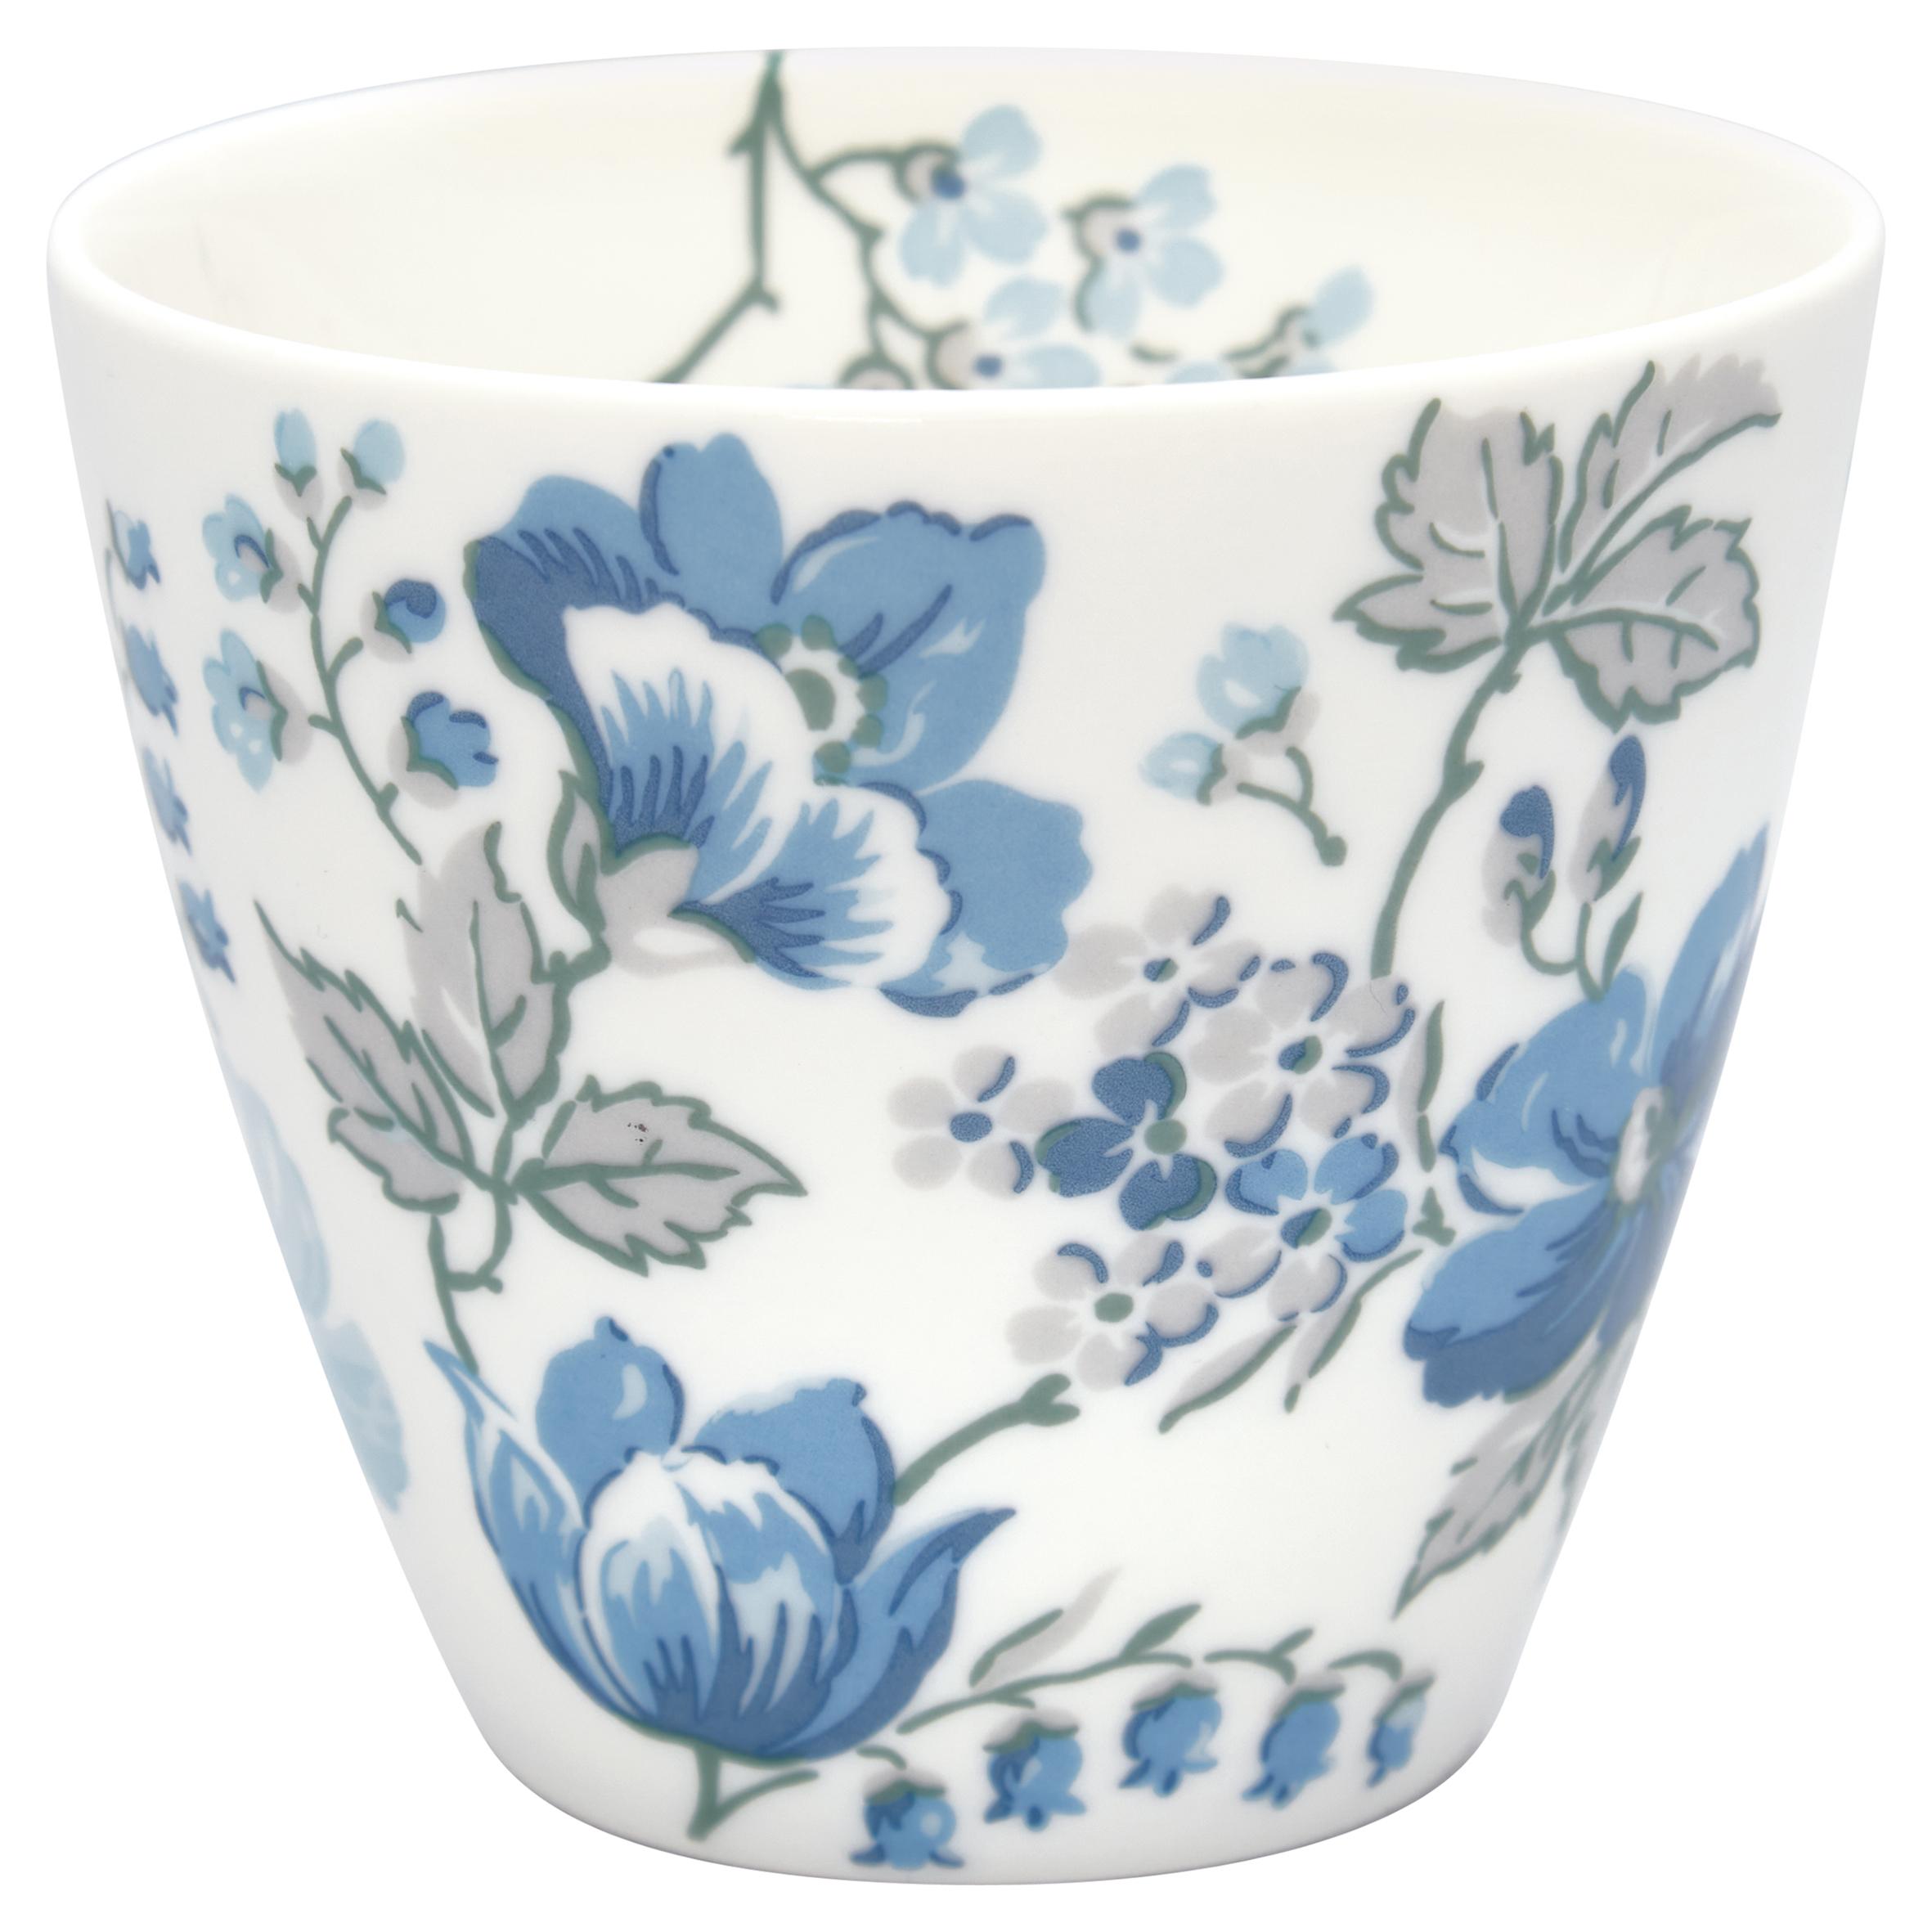 Latte Cup - Donna blue - Greengate